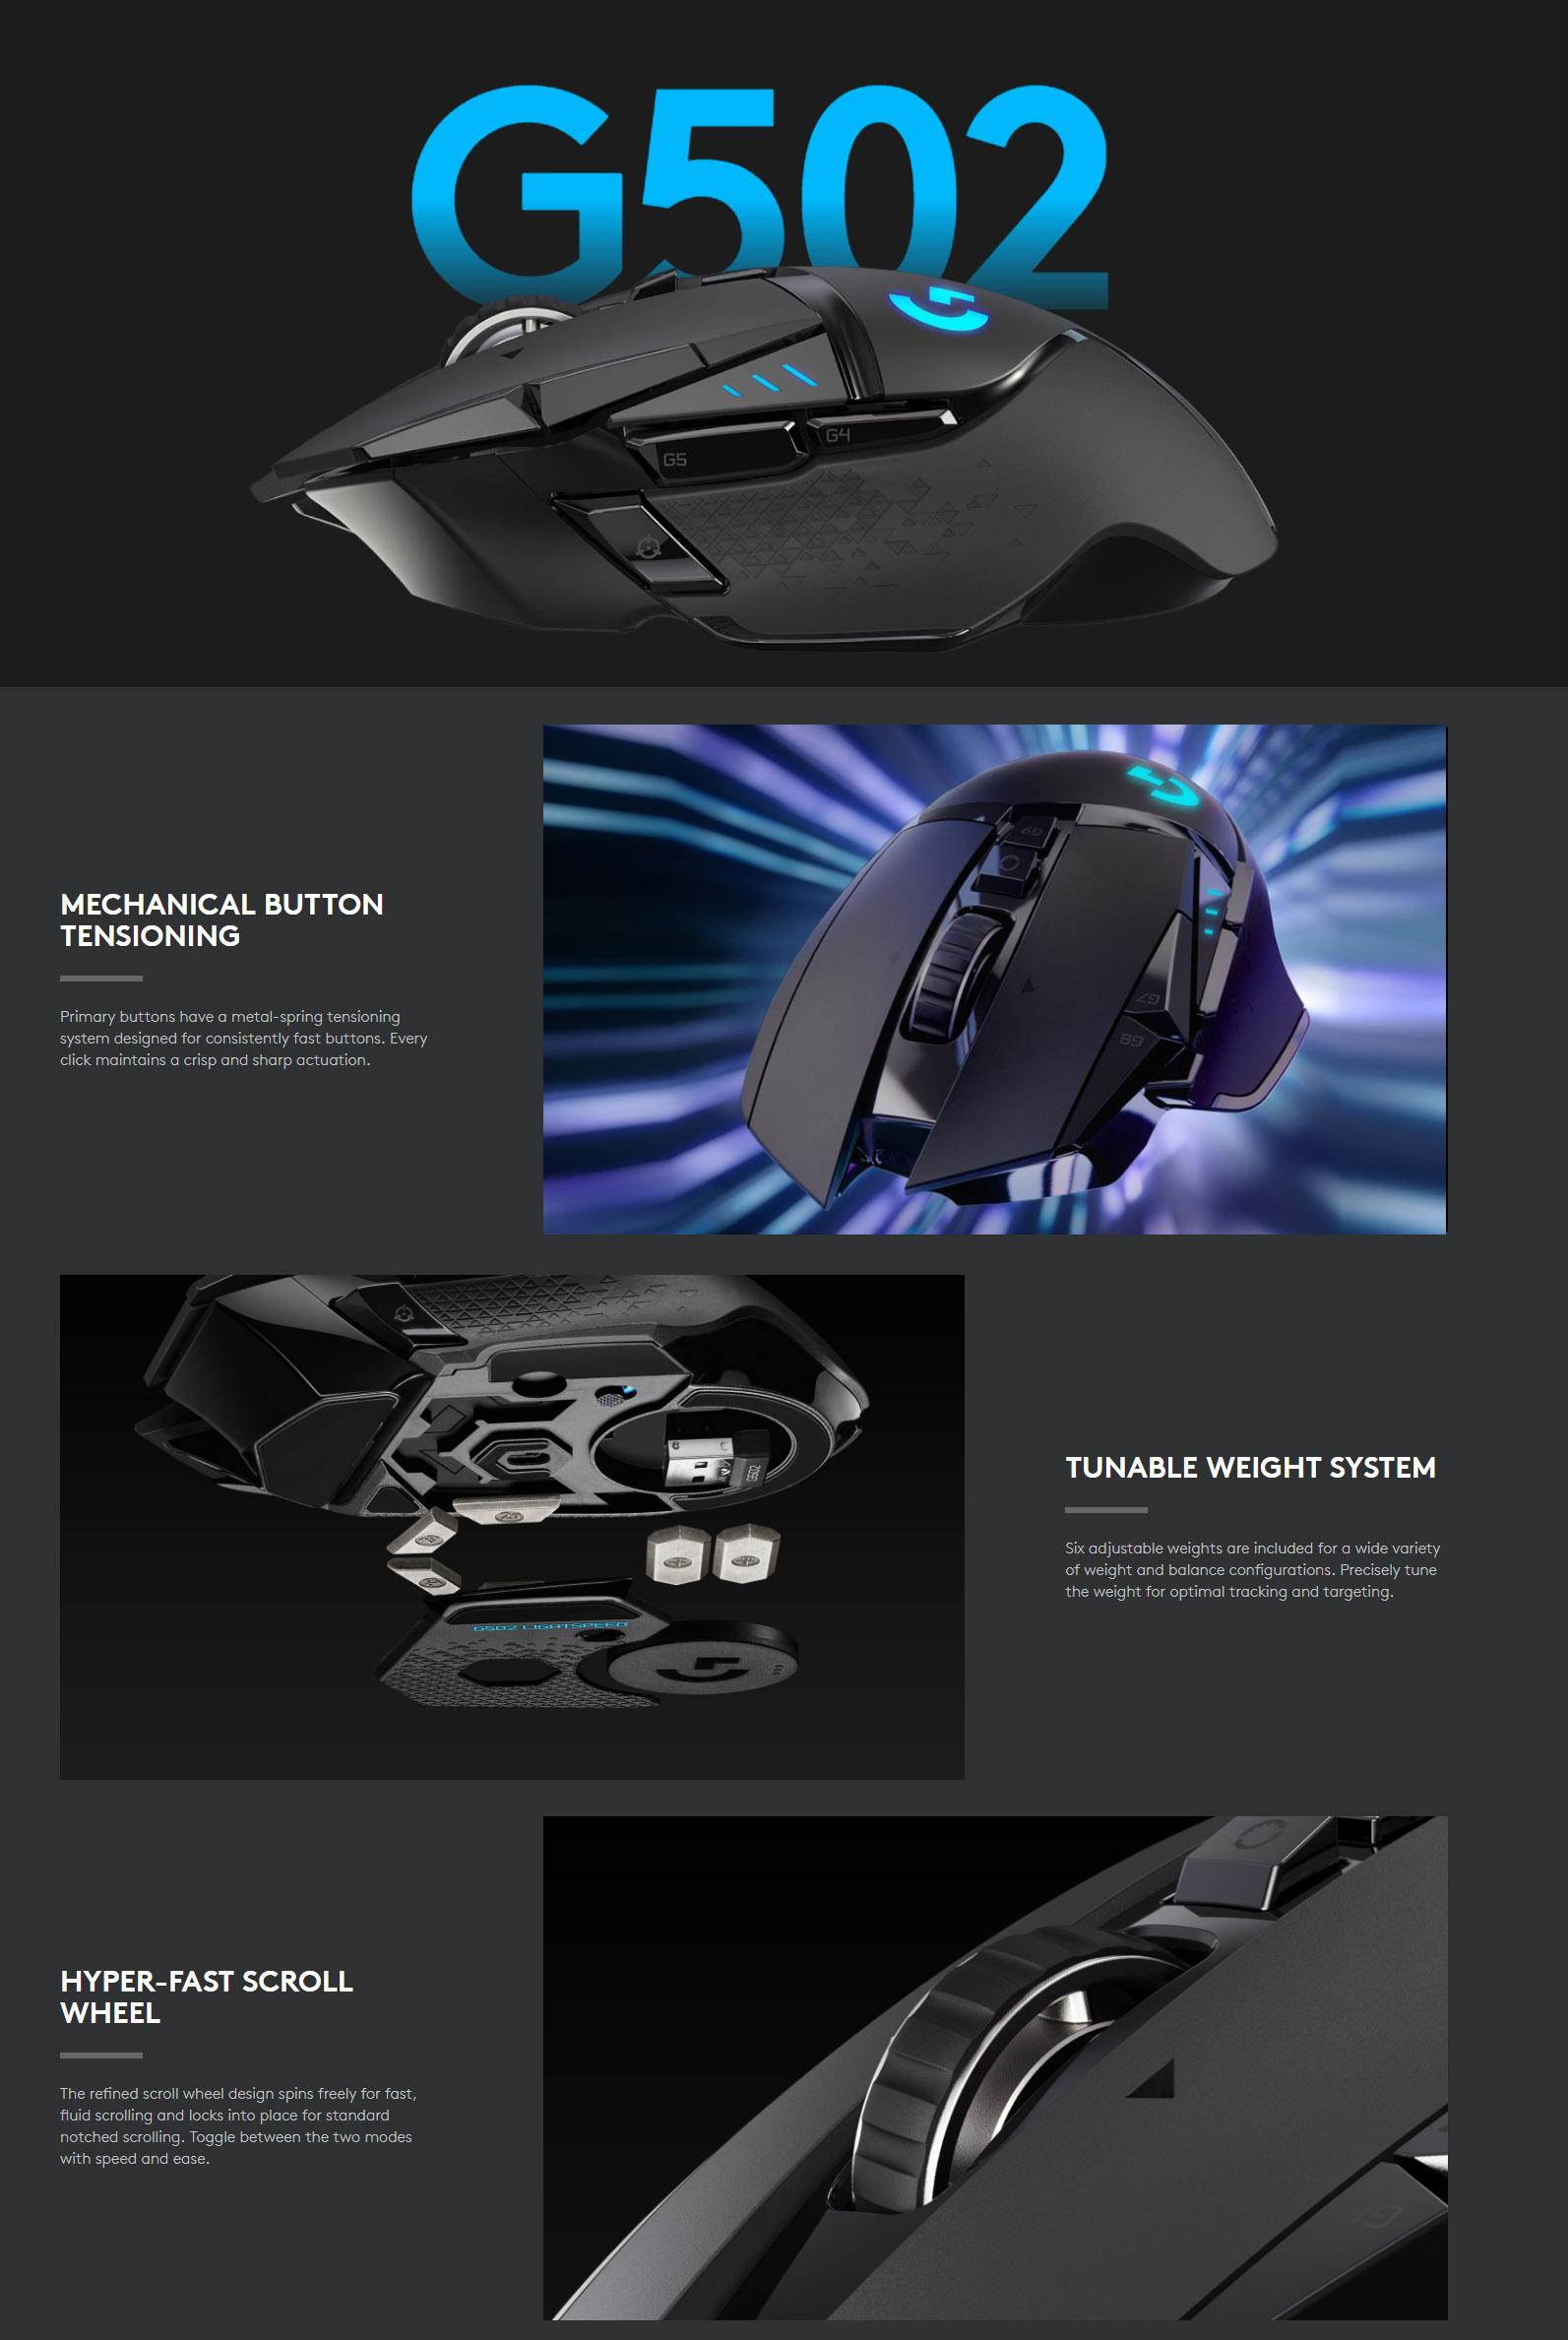 Logitech G502 Wireless Gaming Mouse, LightSpeed, UltraFast, Hero 16K  Sensor, PowerPlay Compatible, 16000 DPI, LightSync RGB, Tunable Weights,